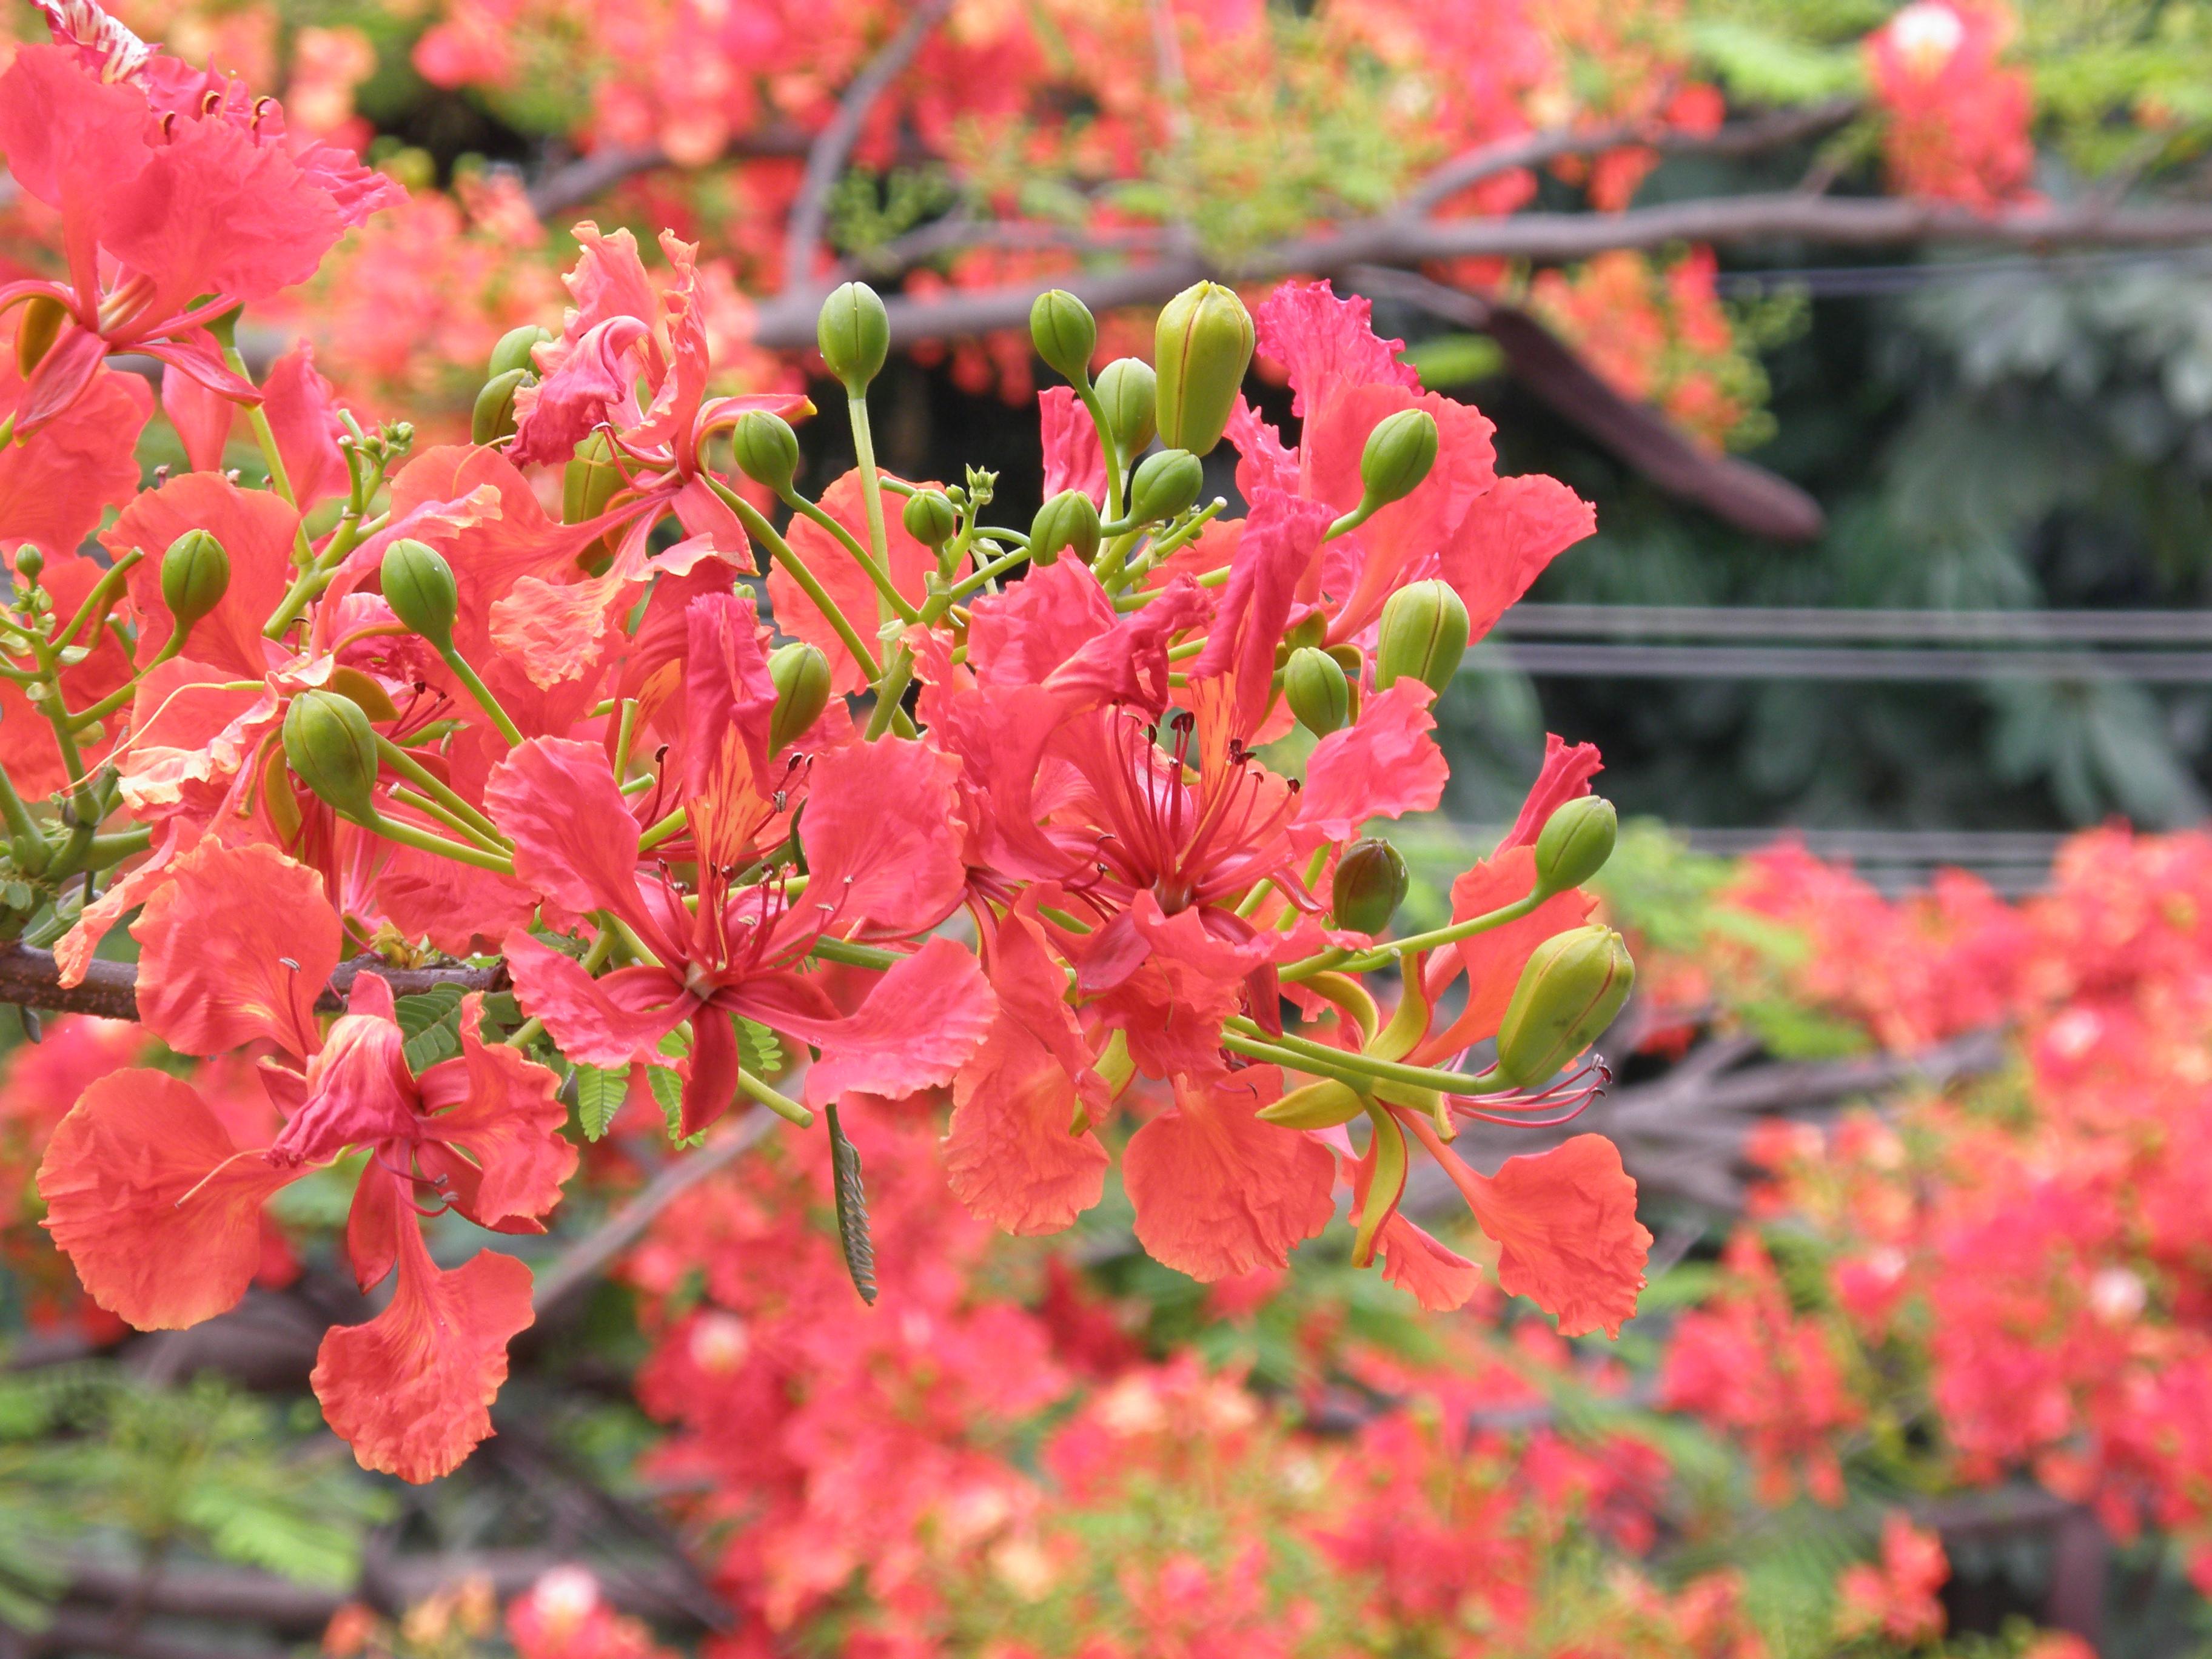 File:Gulmohar flowers closeup 1.JPG Flowers